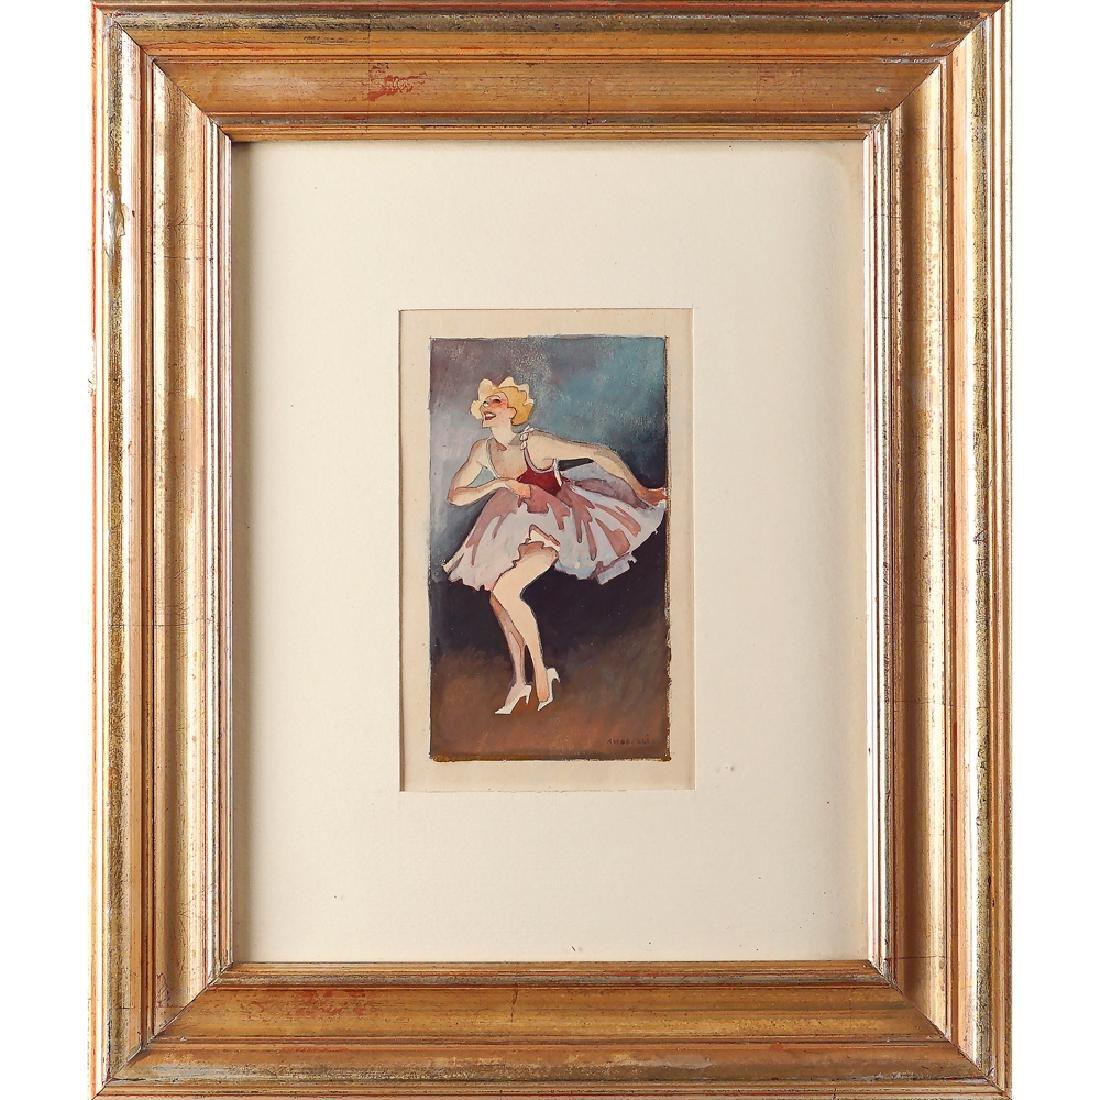 Alfonso Amorelli Palermo 1898 - 1969 16x9 cm.